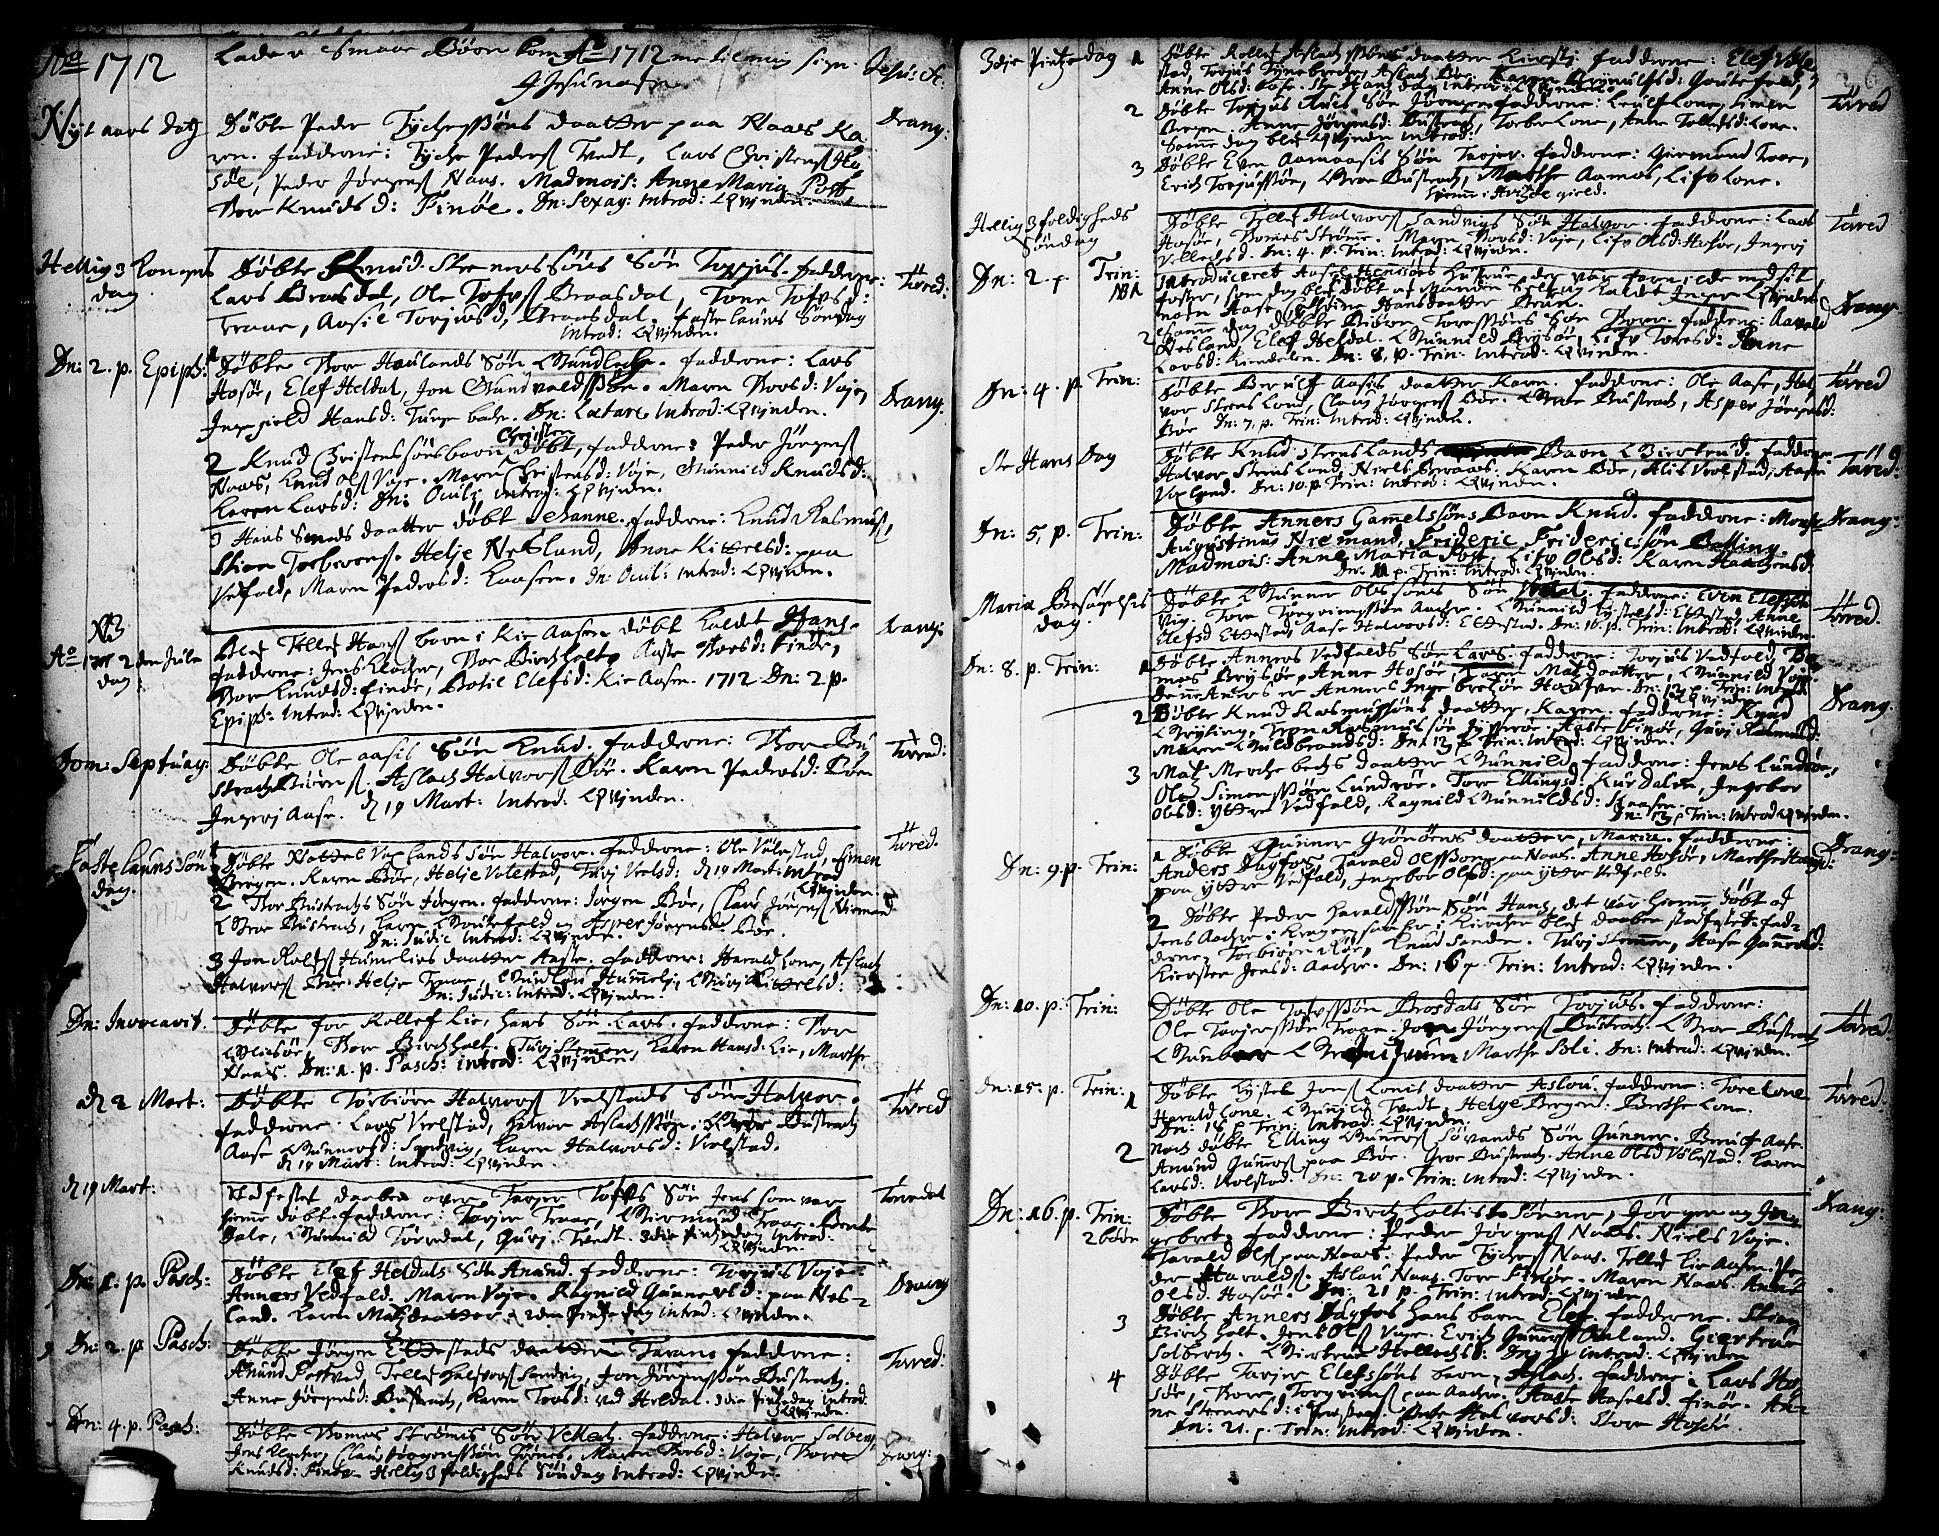 SAKO, Drangedal kirkebøker, F/Fa/L0001: Ministerialbok nr. 1, 1697-1767, s. 26